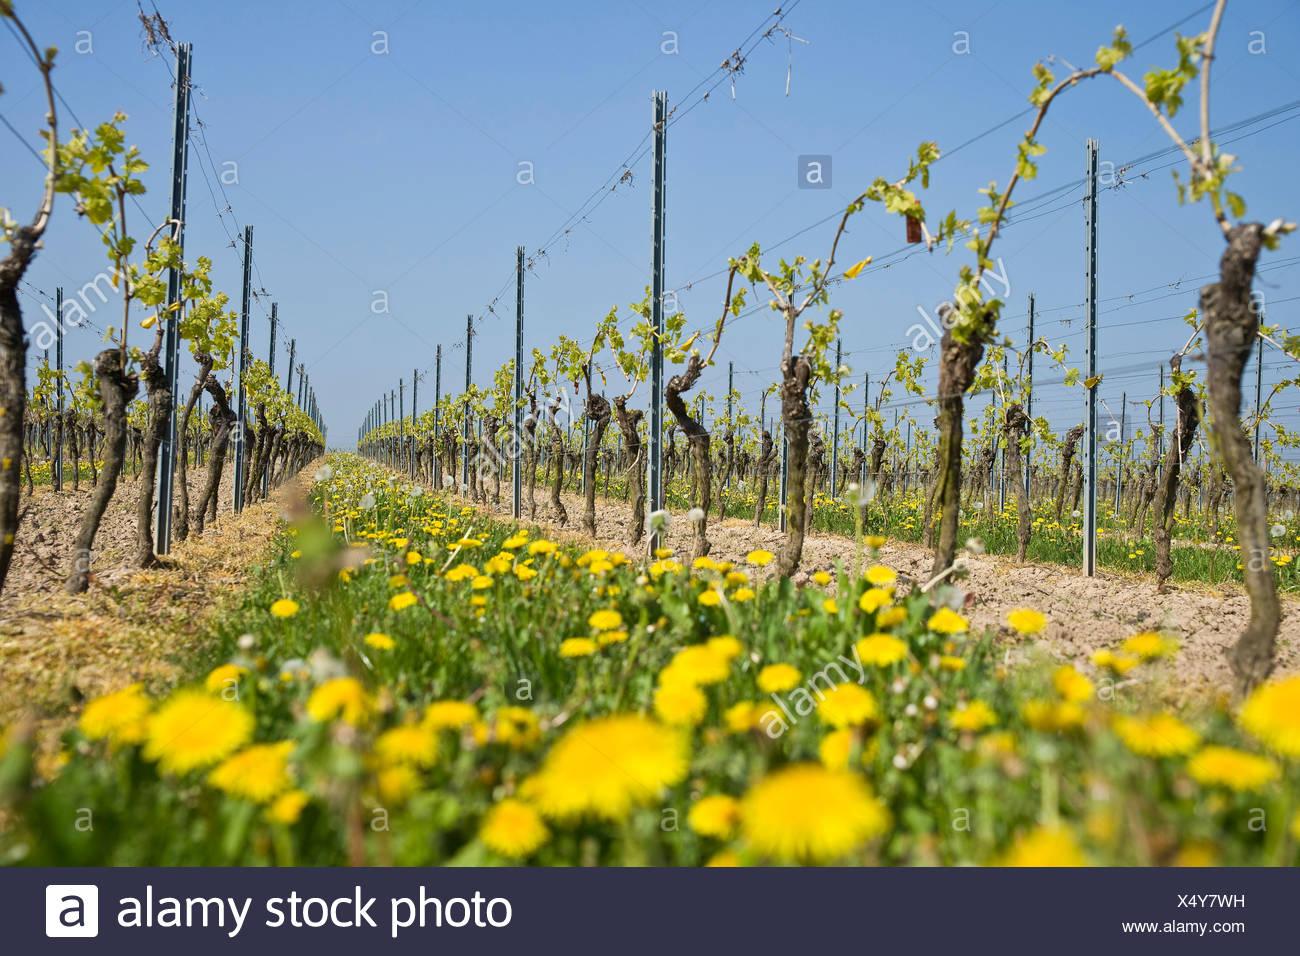 Grapevine Stock Photo